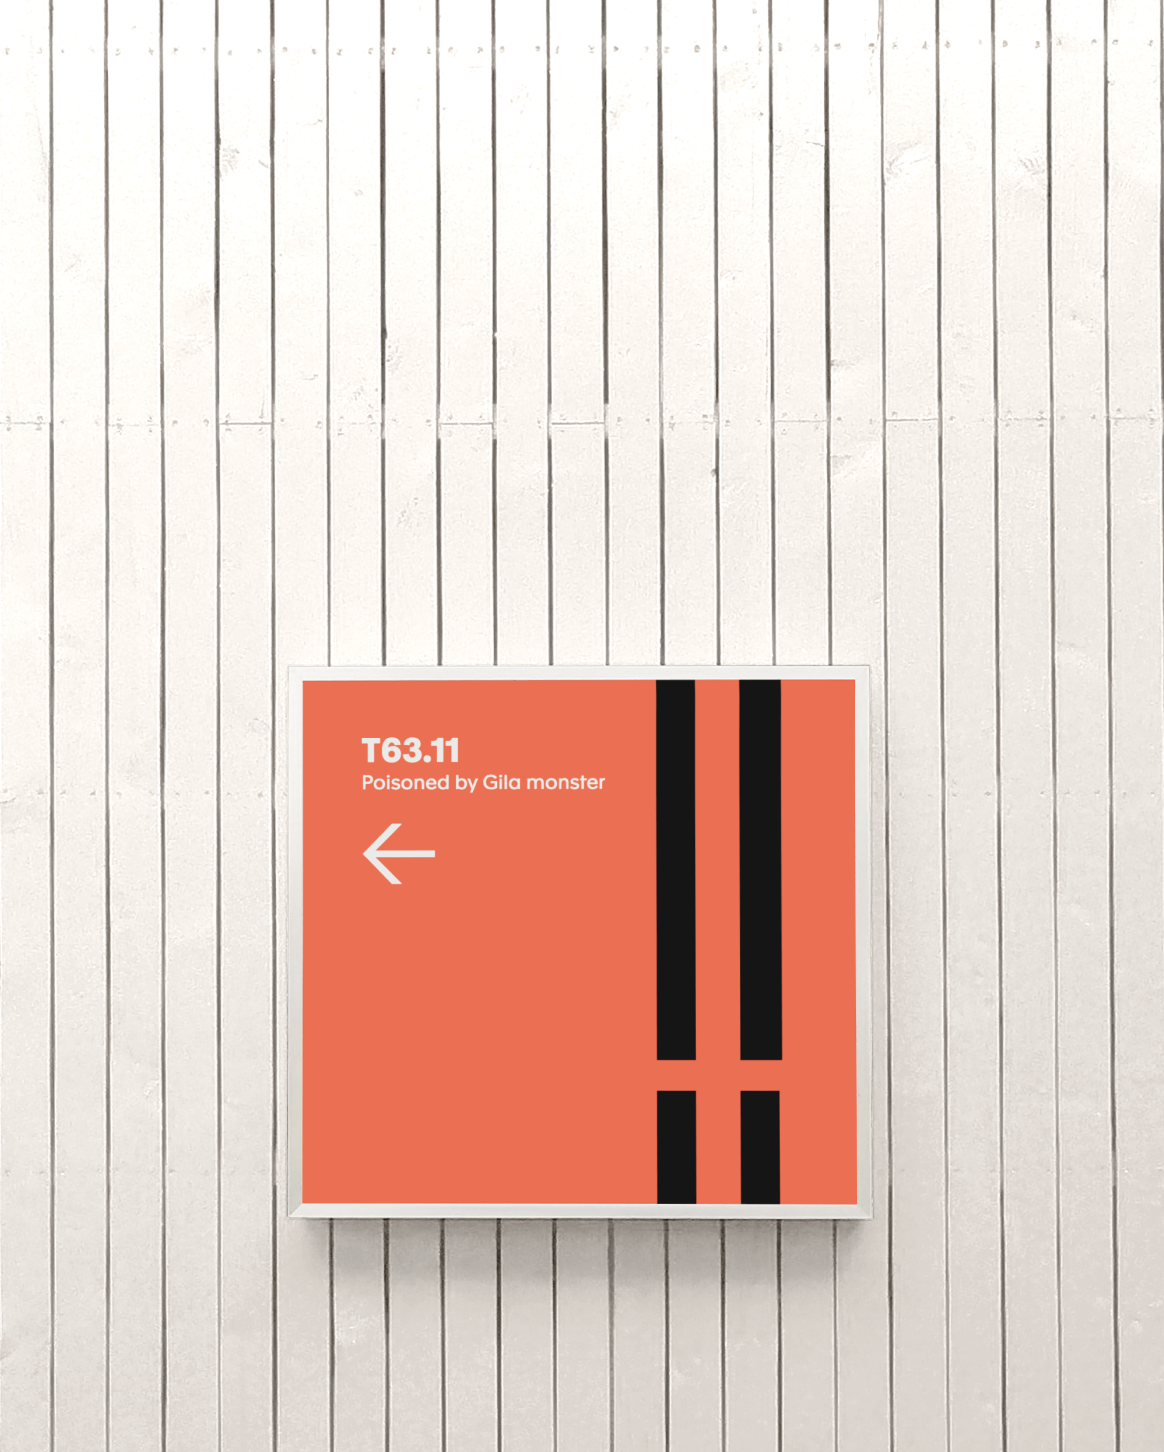 Aetion signage